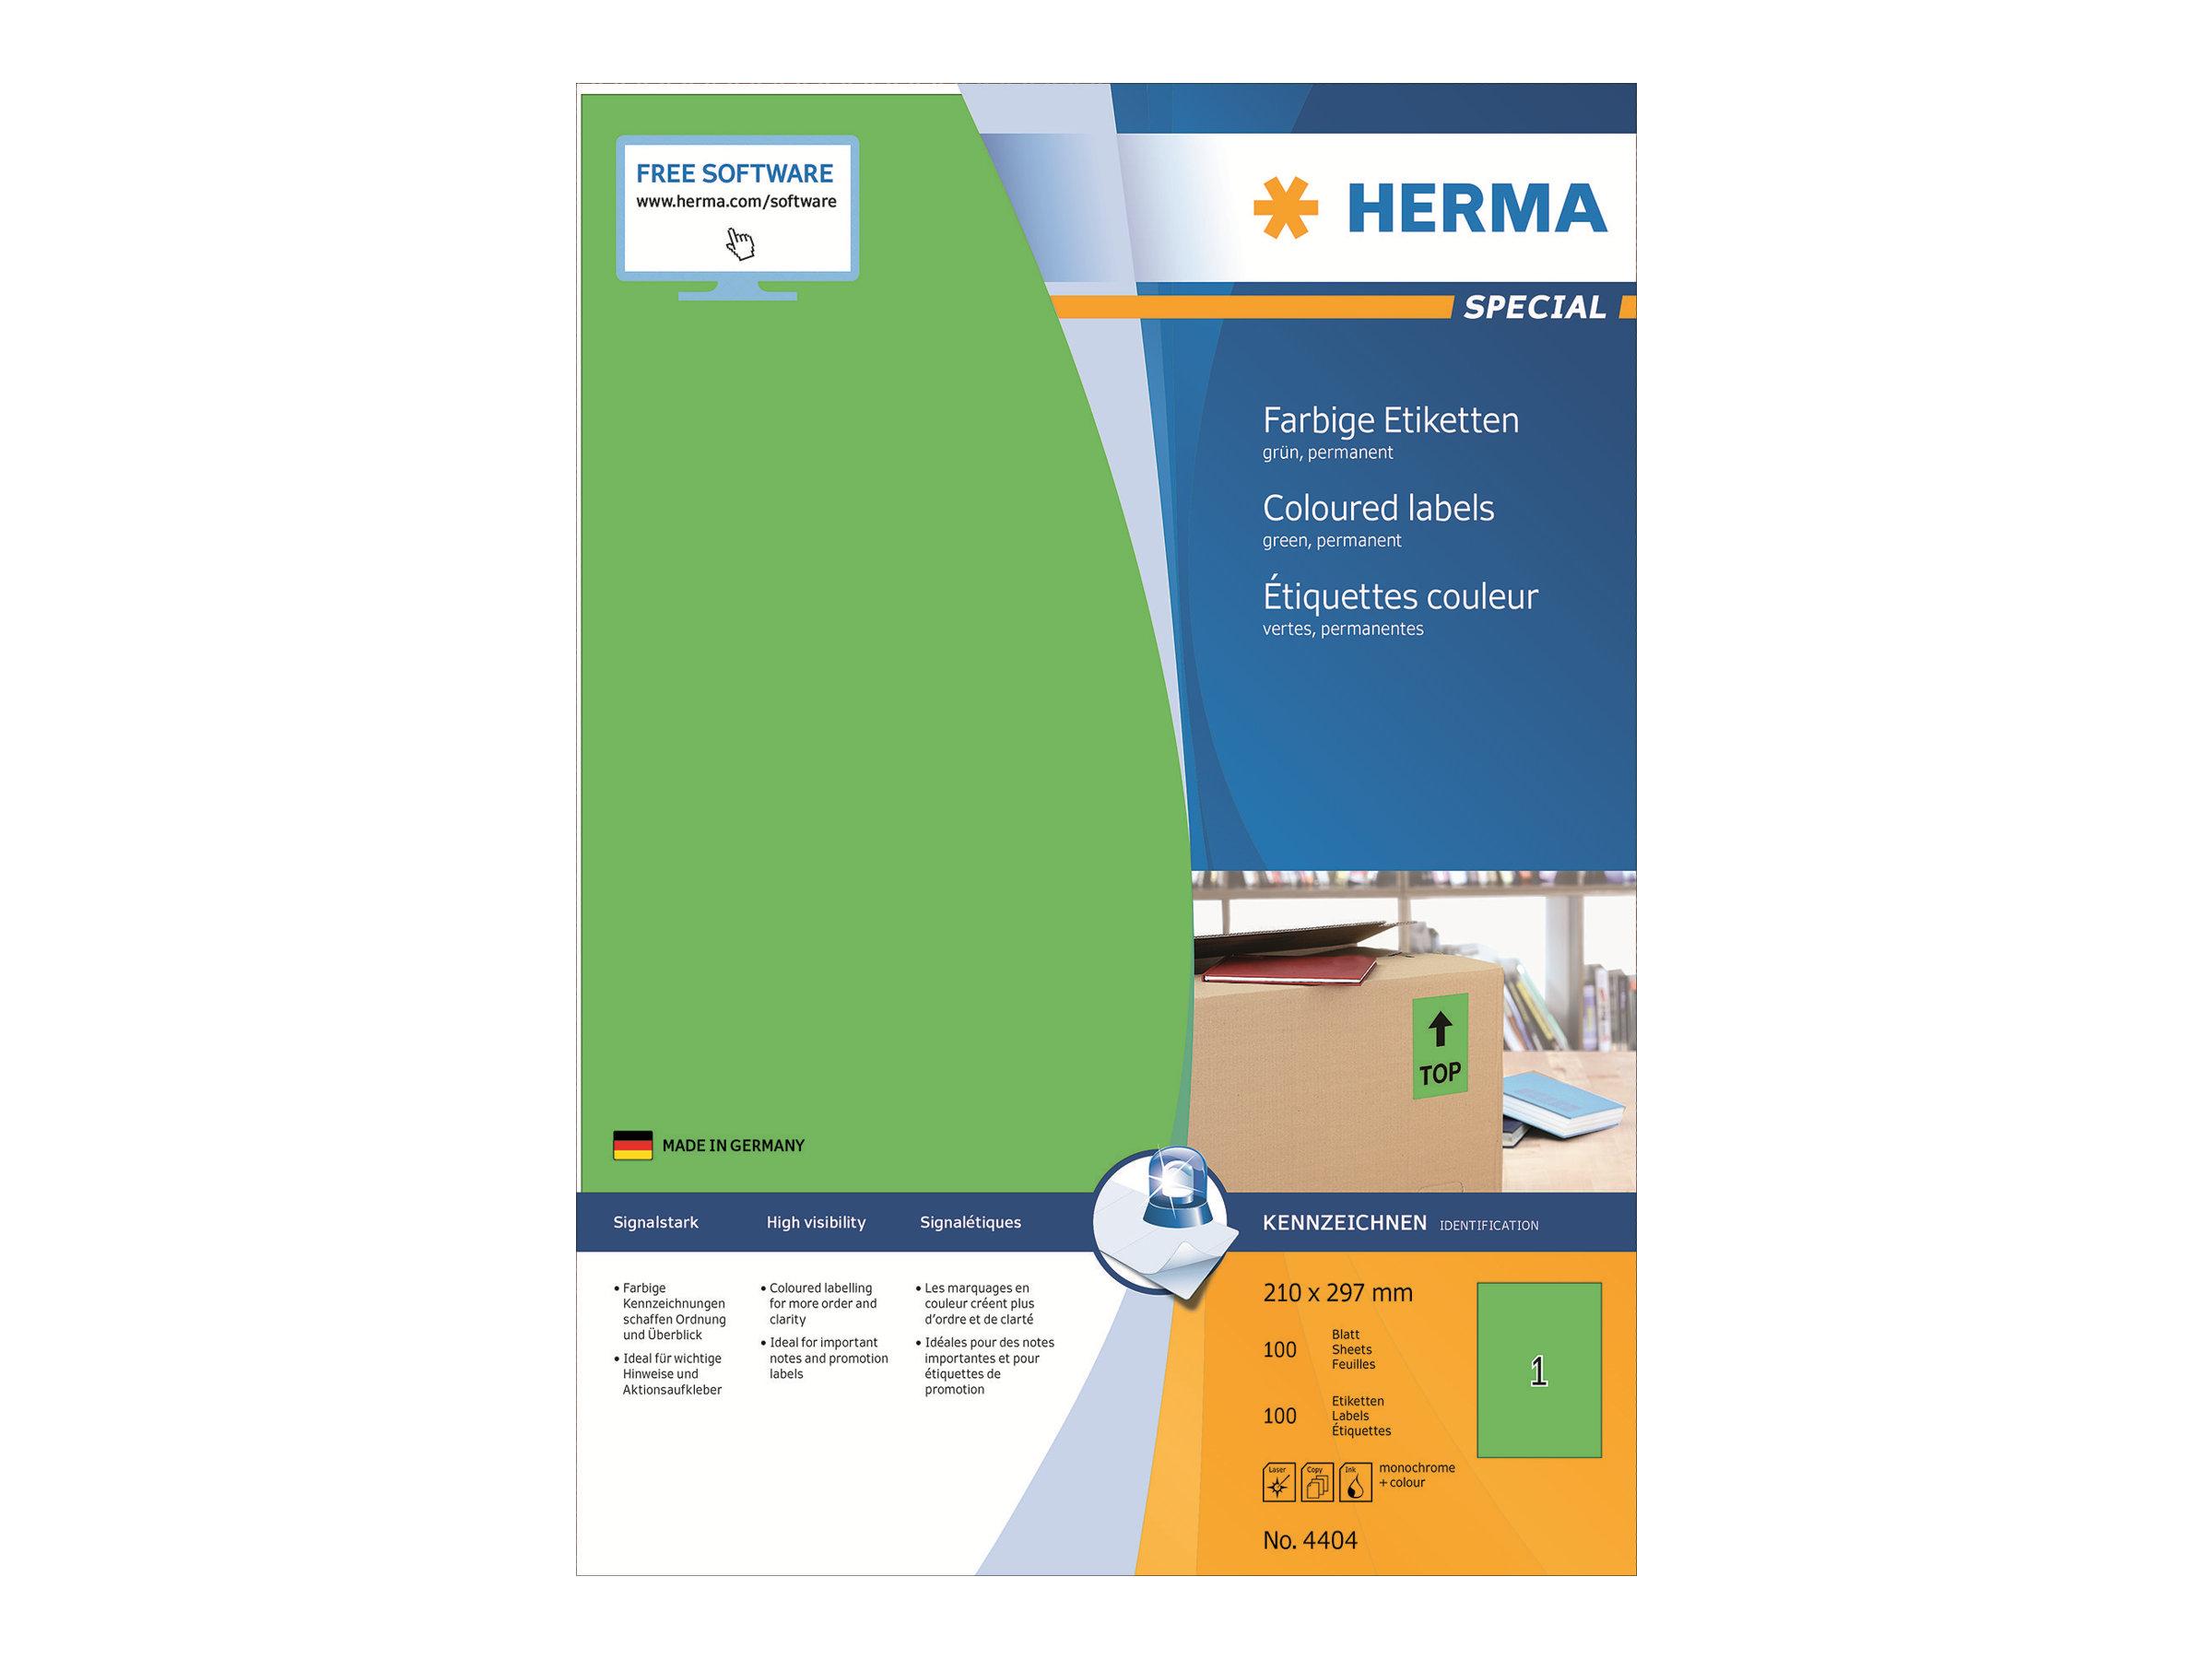 HERMA Special - Papier - matt - permanent selbstklebend - grün - A4 (210 x 297 mm)